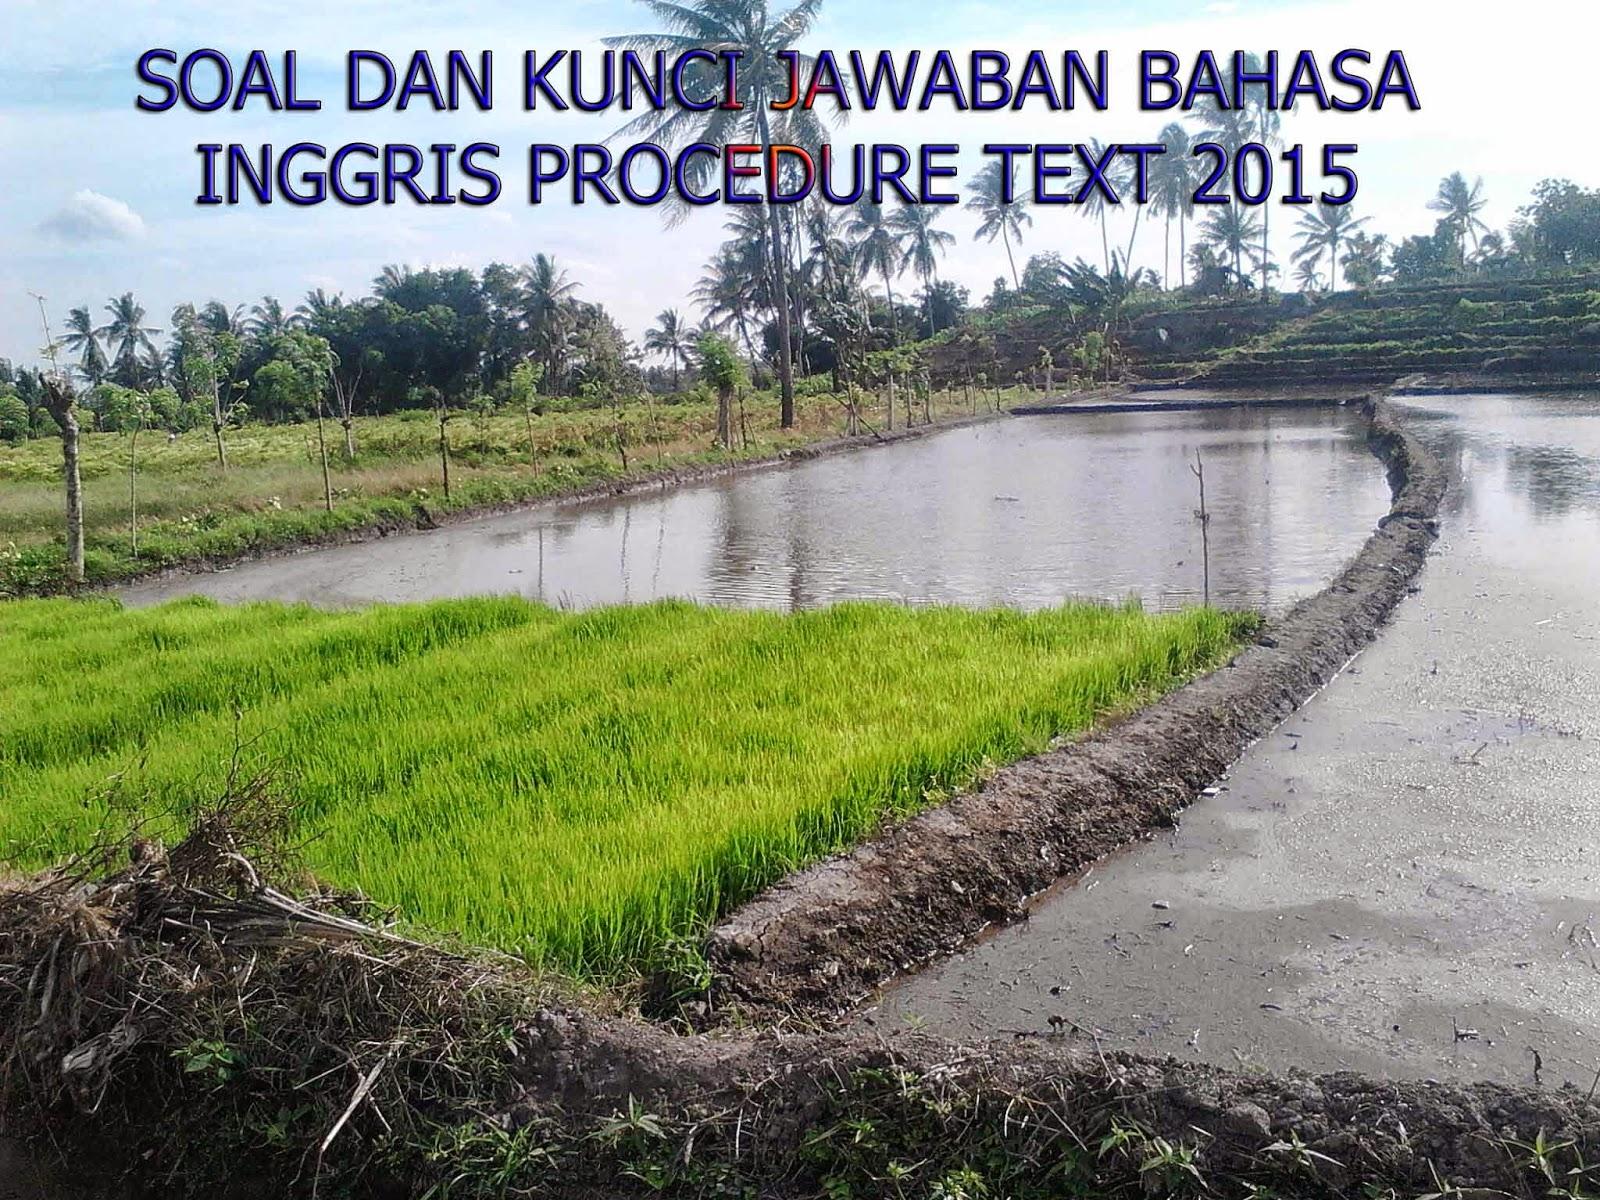 Soal Dan Kunci Jawaban Bahasa Inggris Procedure Text 2015 Kumpulan